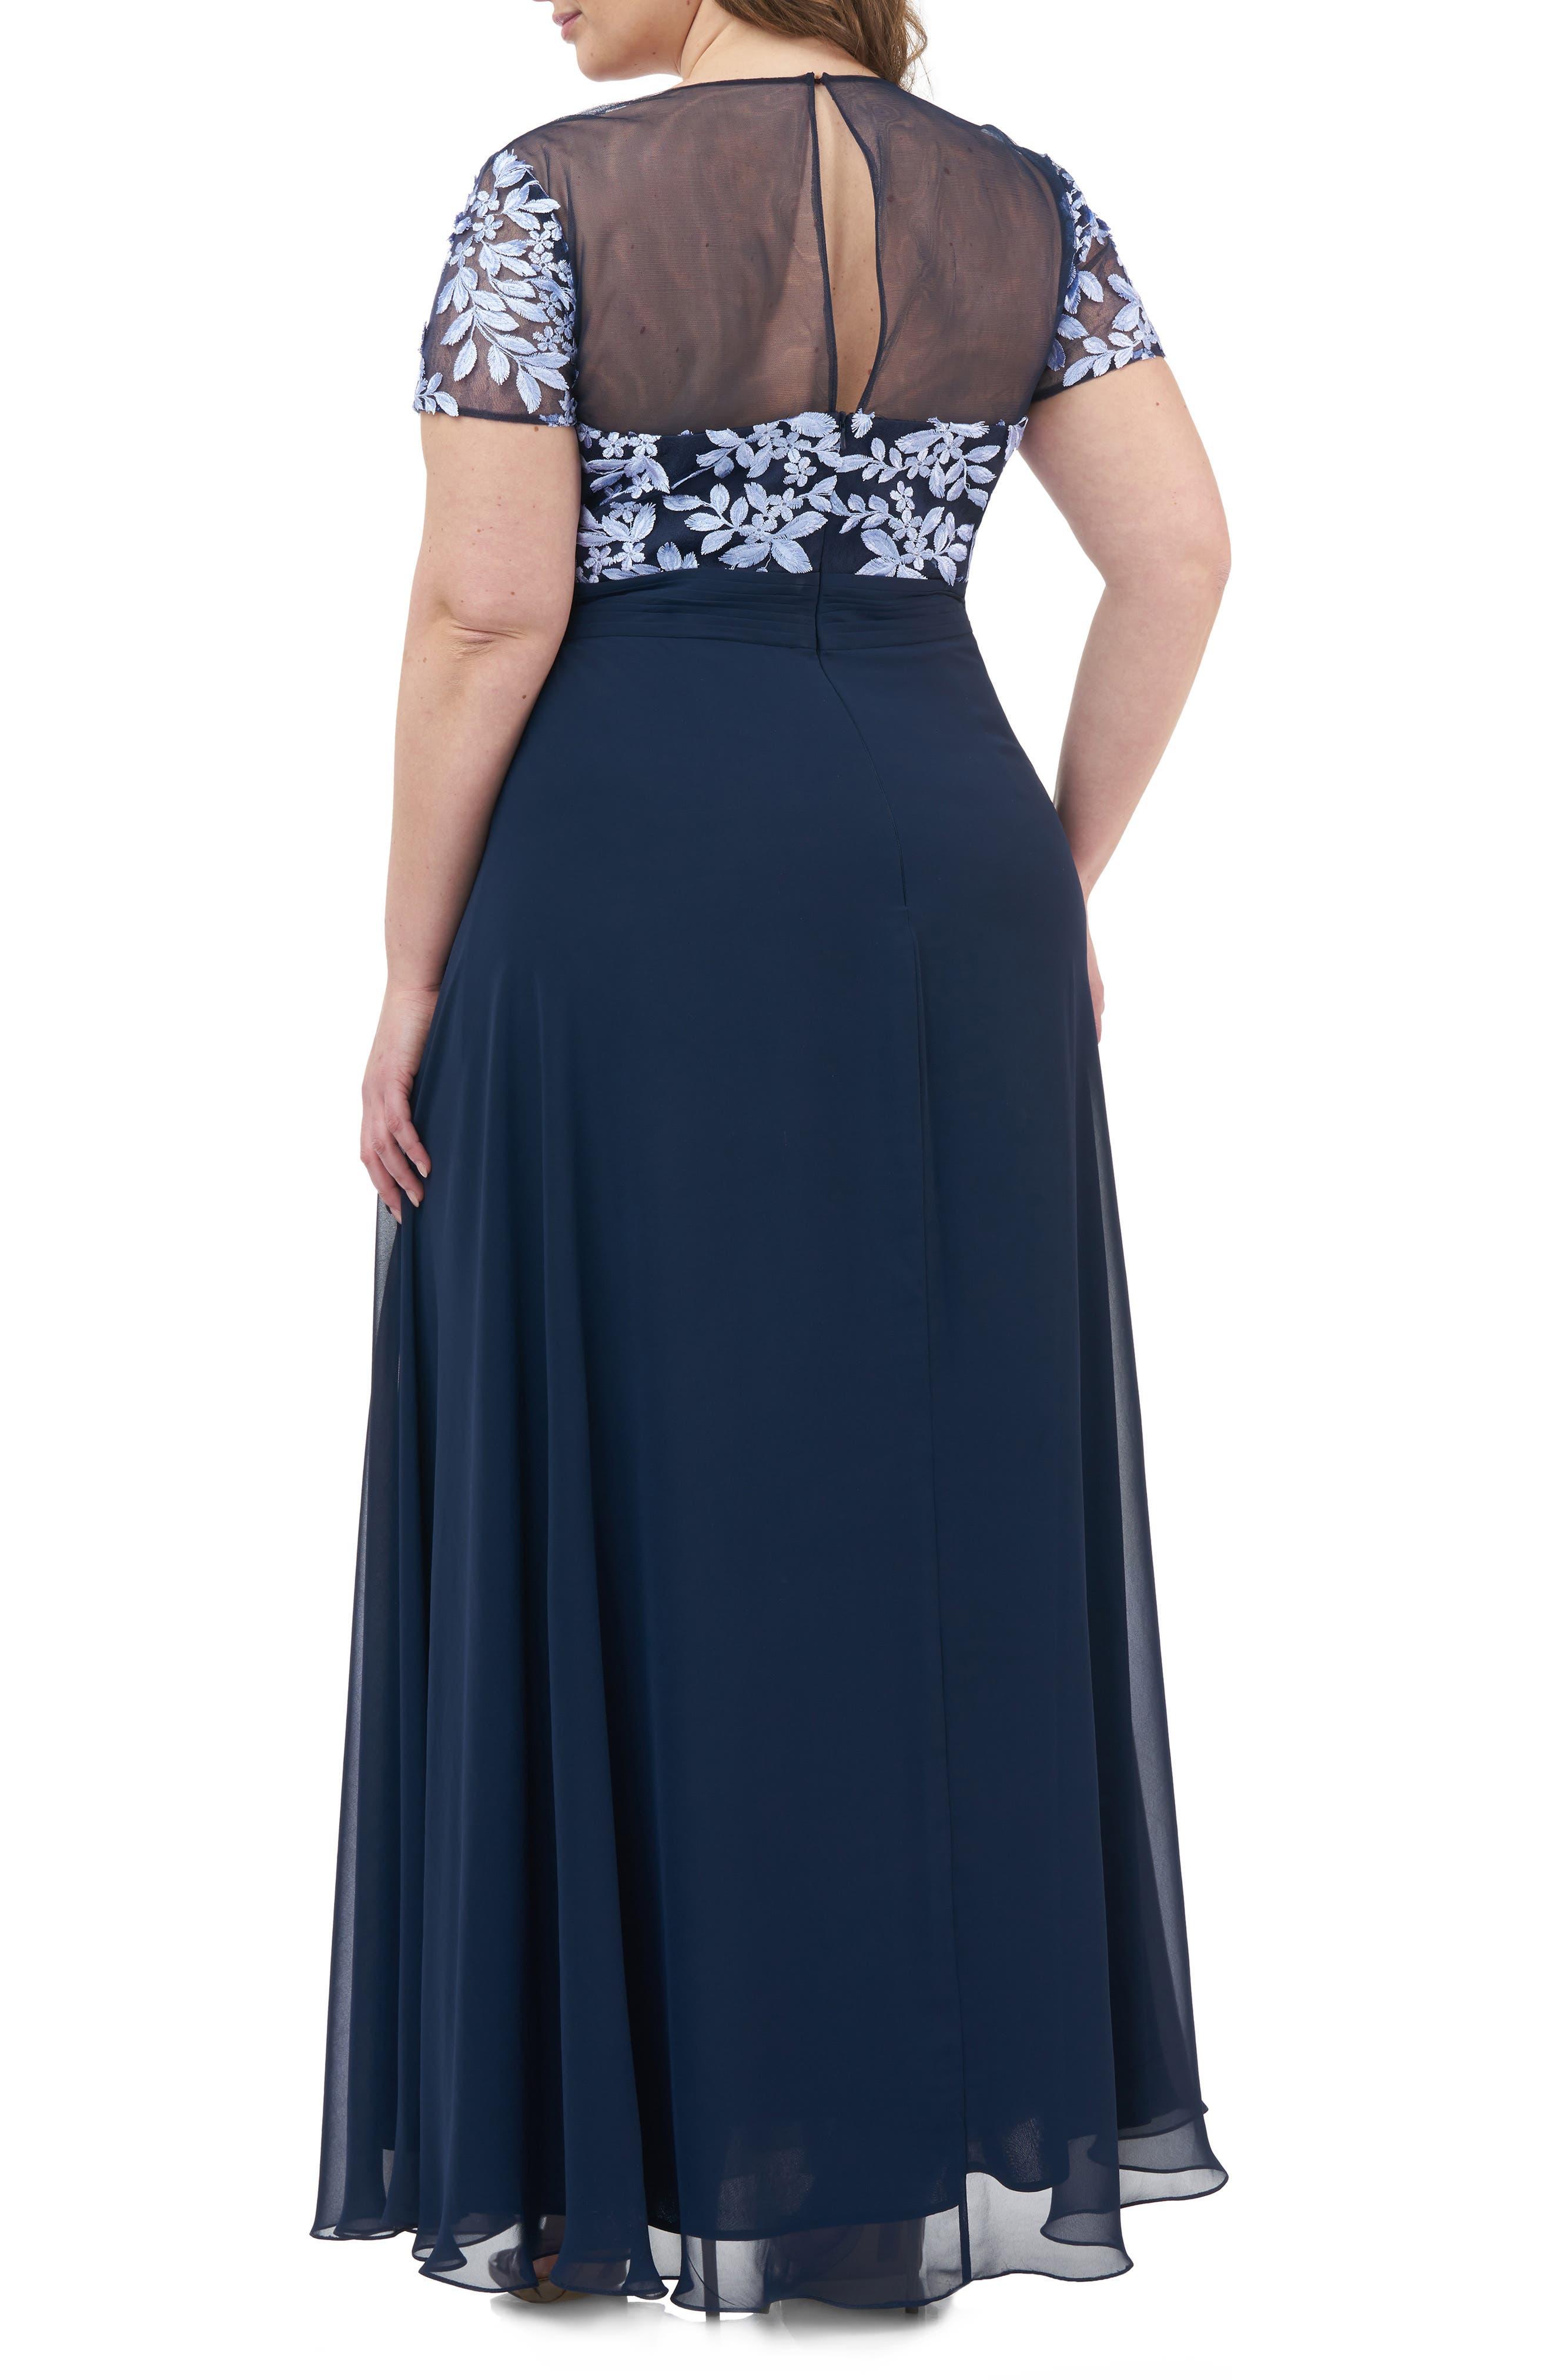 17b2931efe9 Women's Empire Waist Dresses | Nordstrom